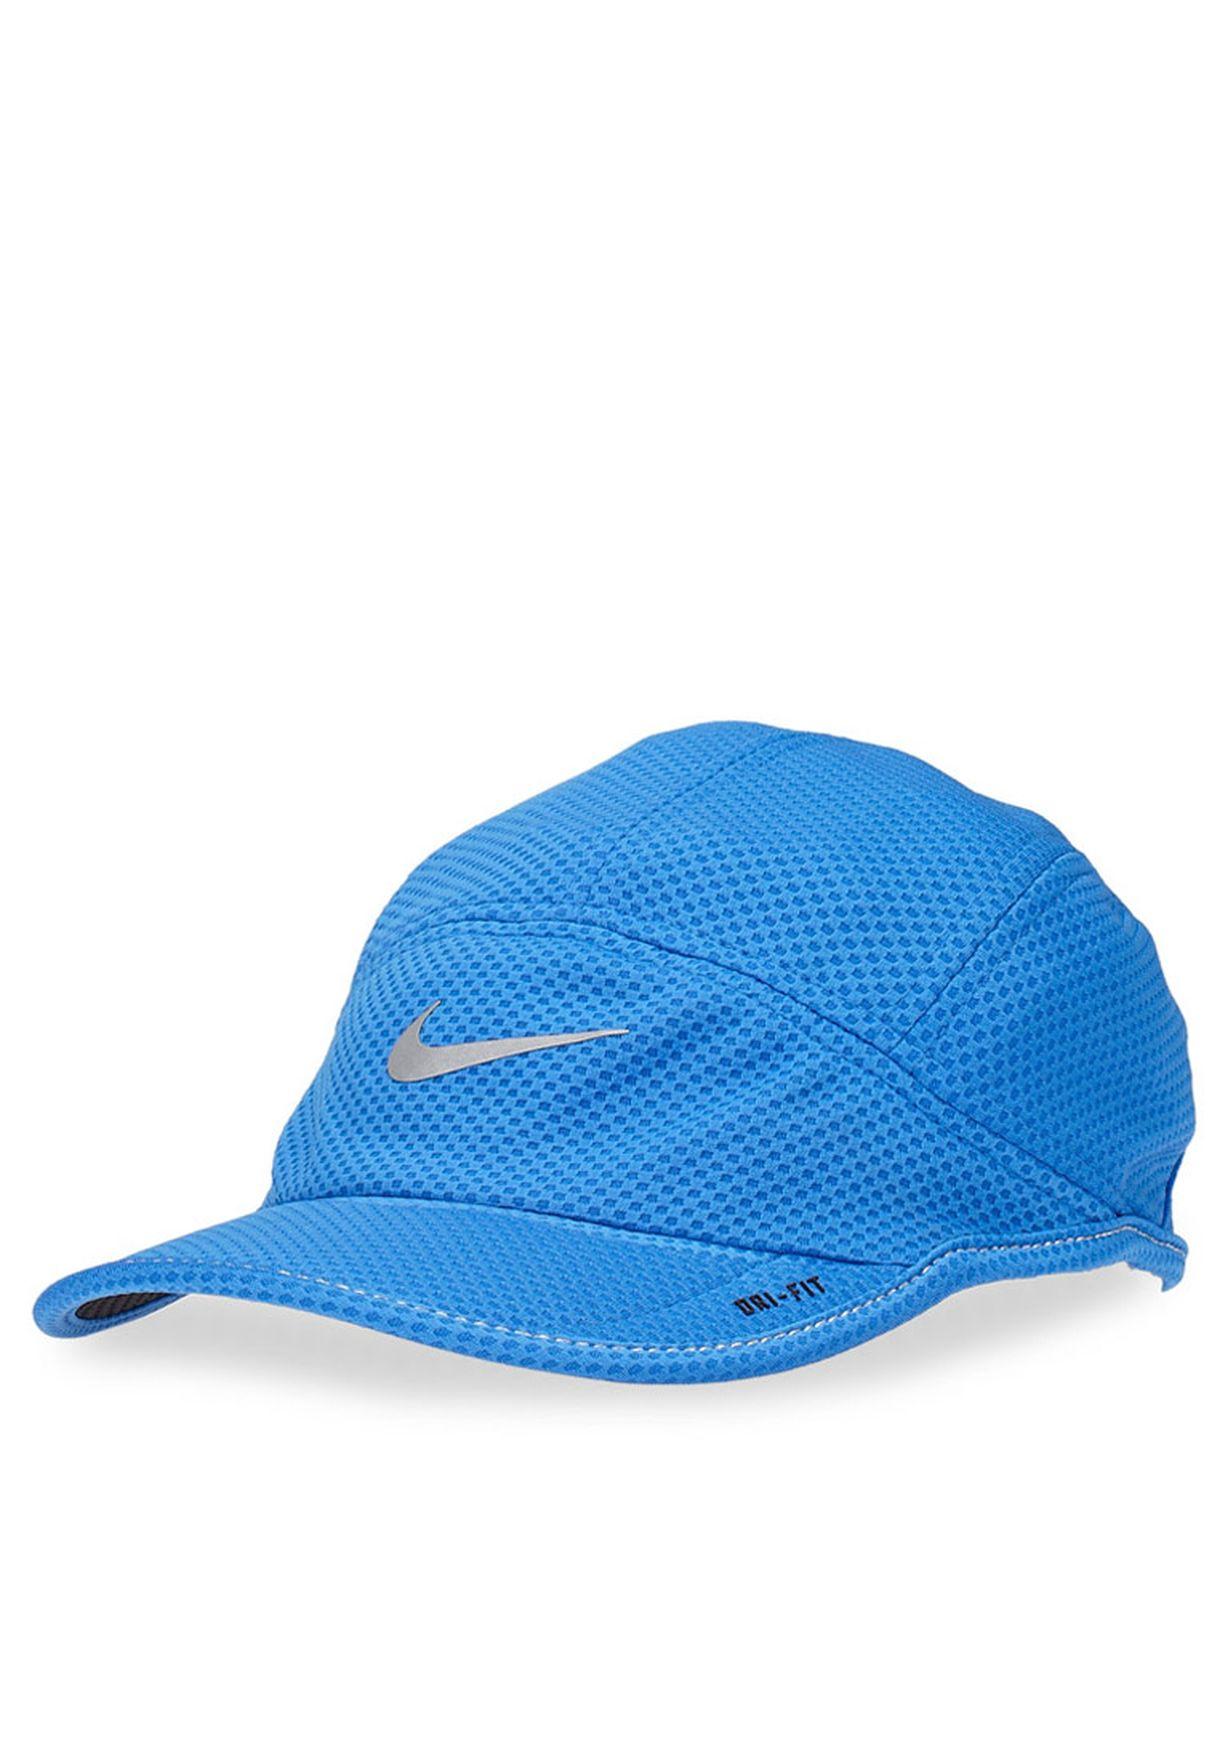 d7c0dd4b763 Shop Nike blue Mesh Daybreak Cap NKAP520787-440 for Men in UAE ...